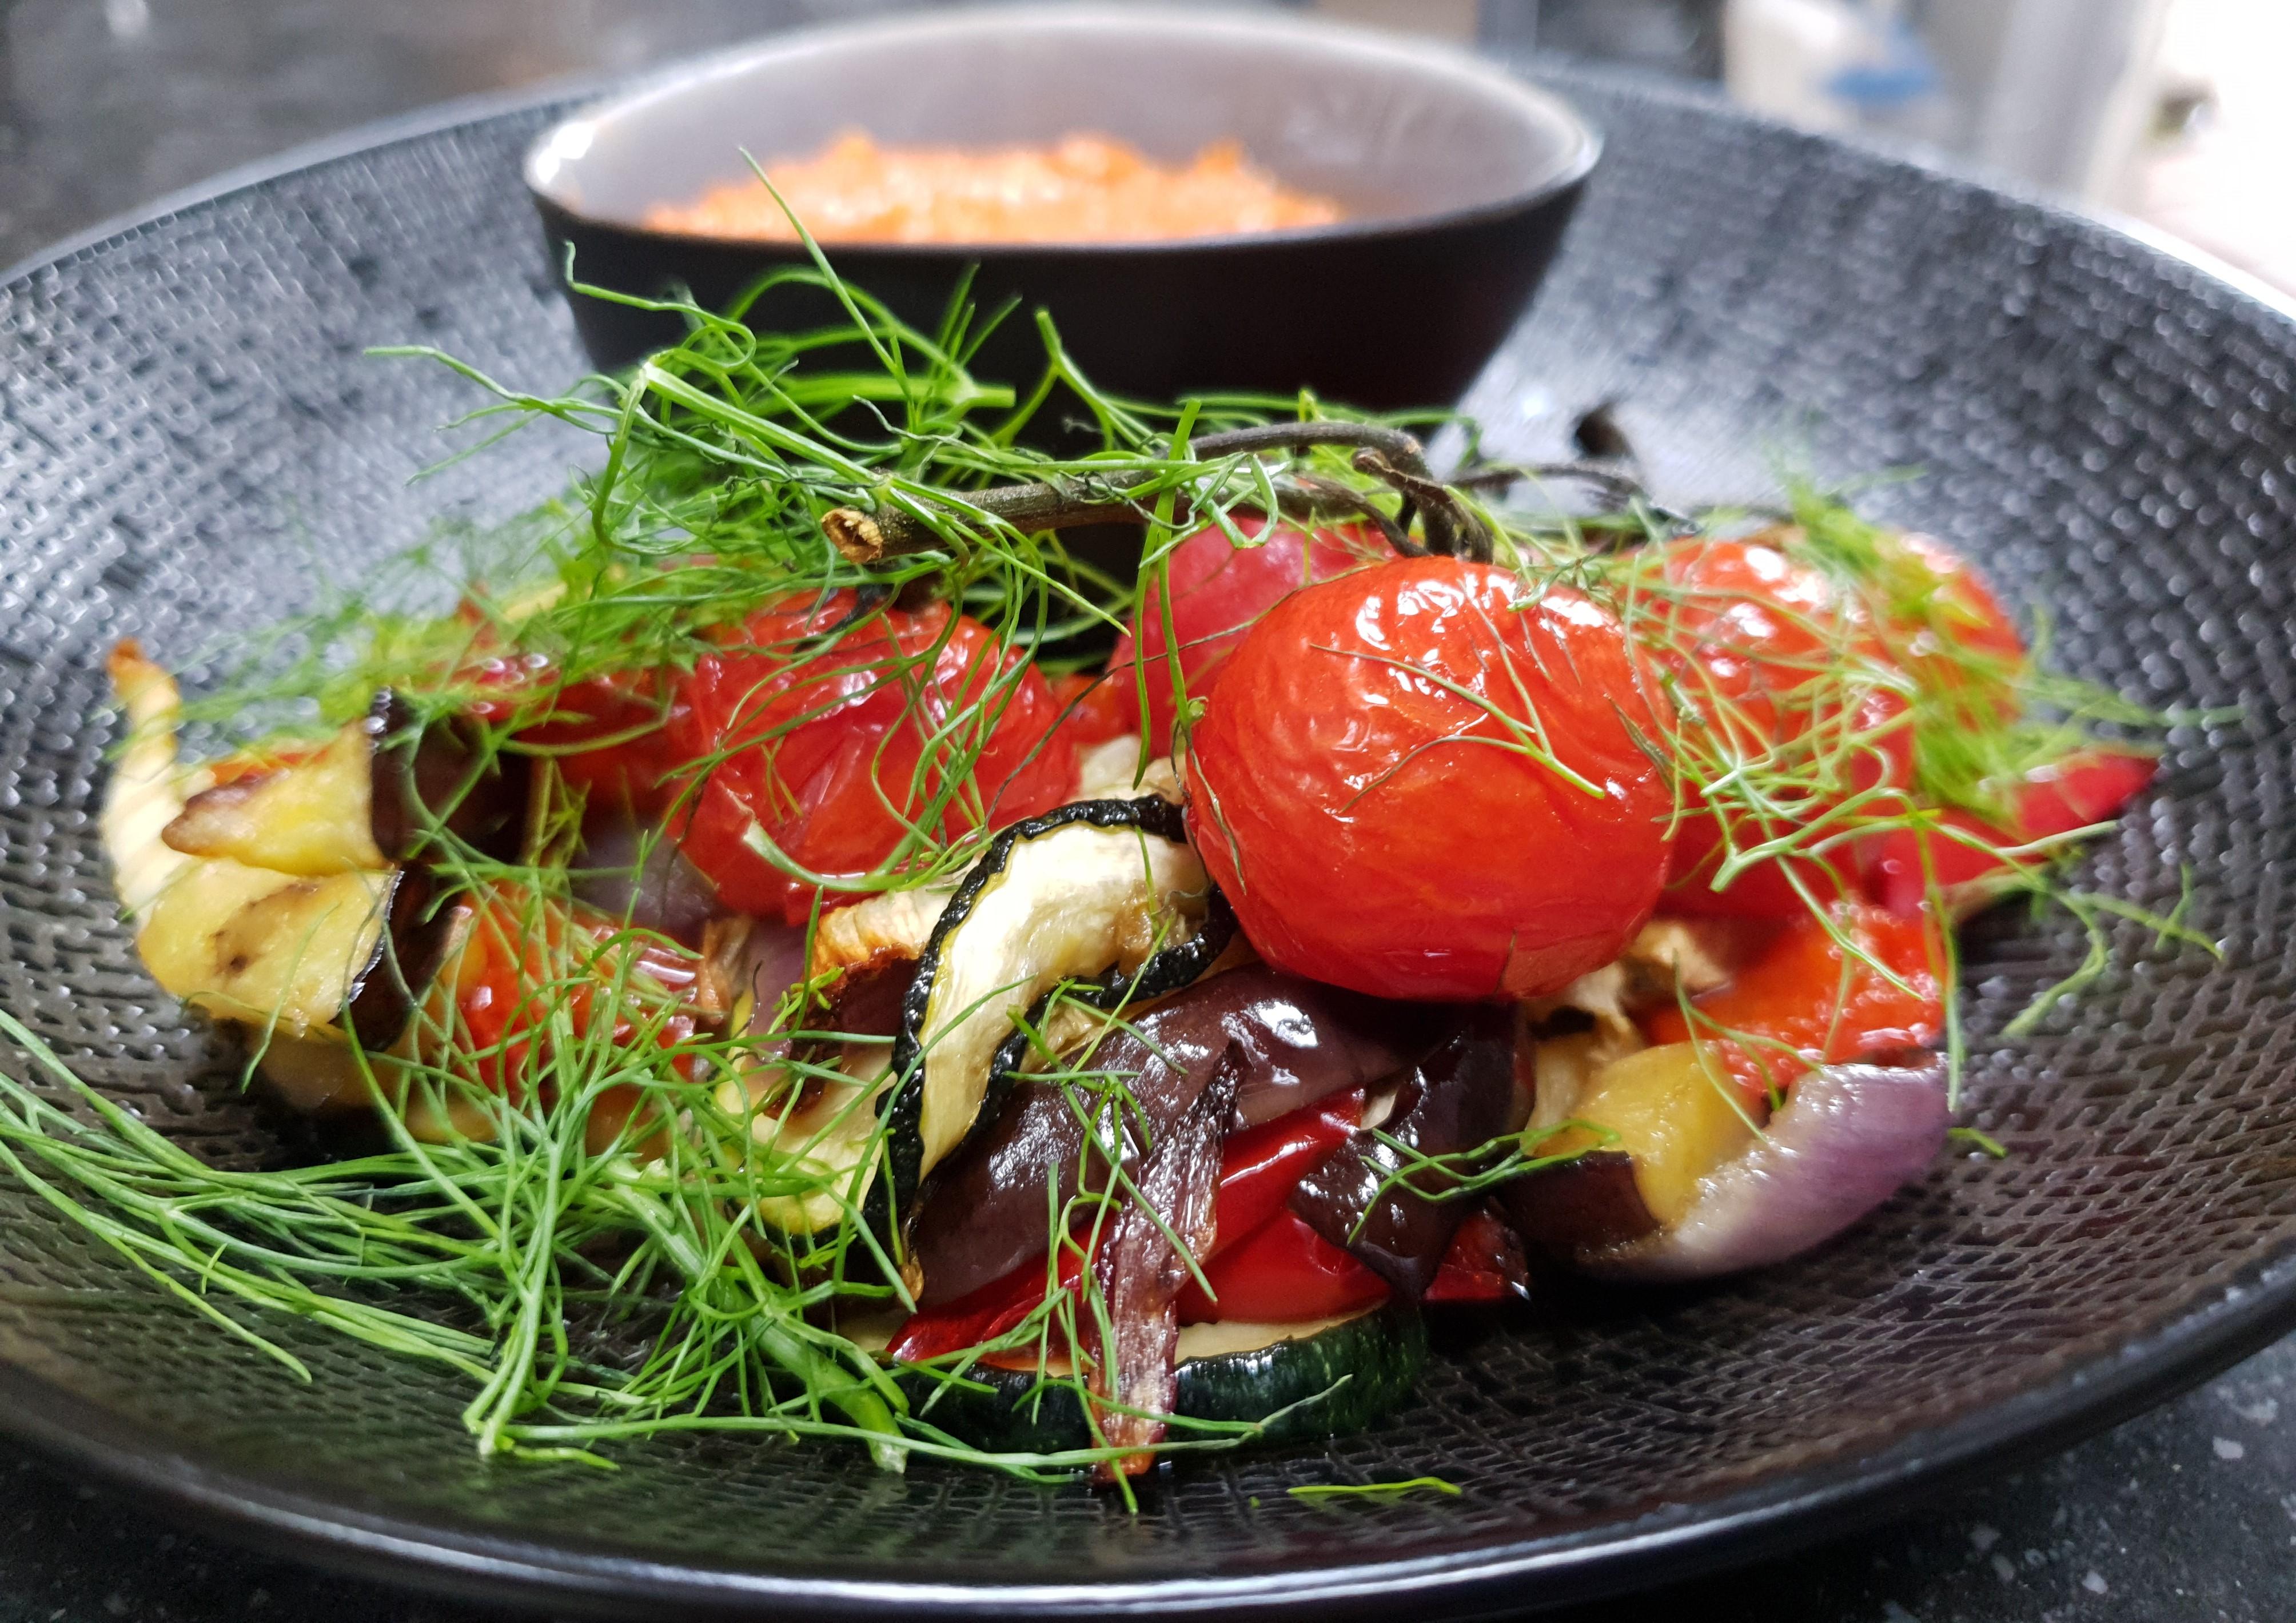 Grilled veggies&romesco